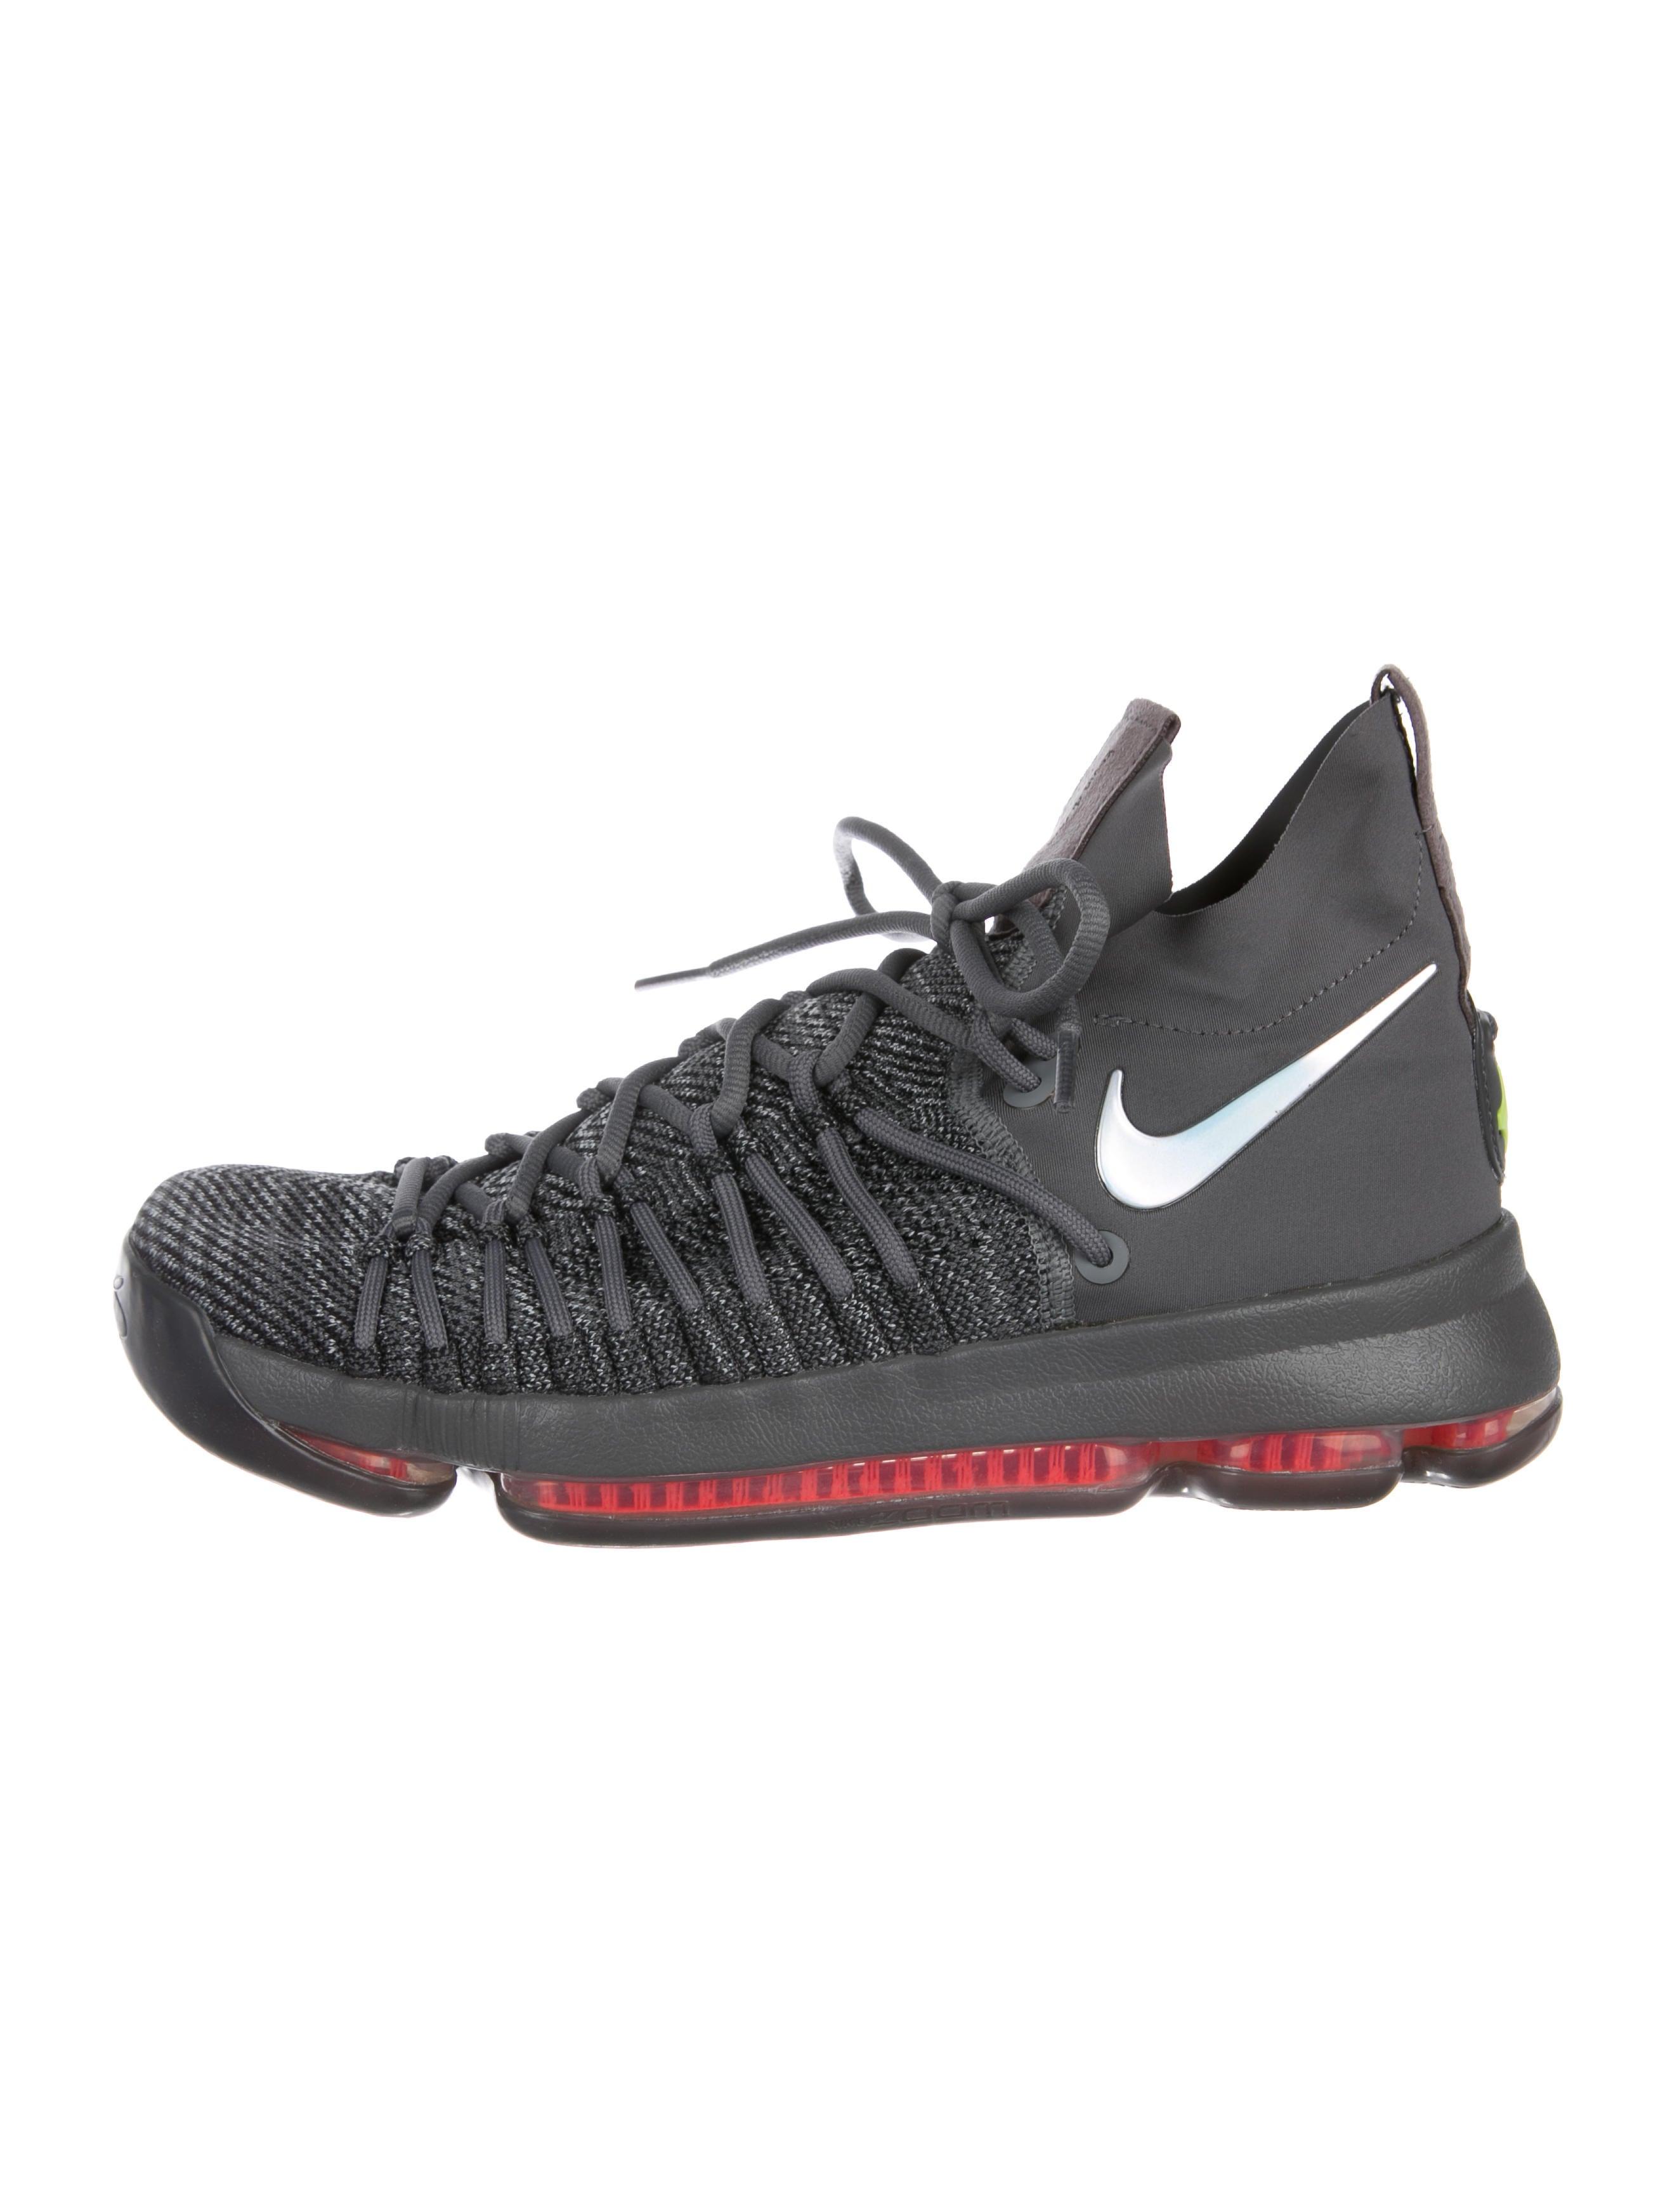 separation shoes 1df8e 68838 Nike KD 9 Elite Time to Shine Sneakers